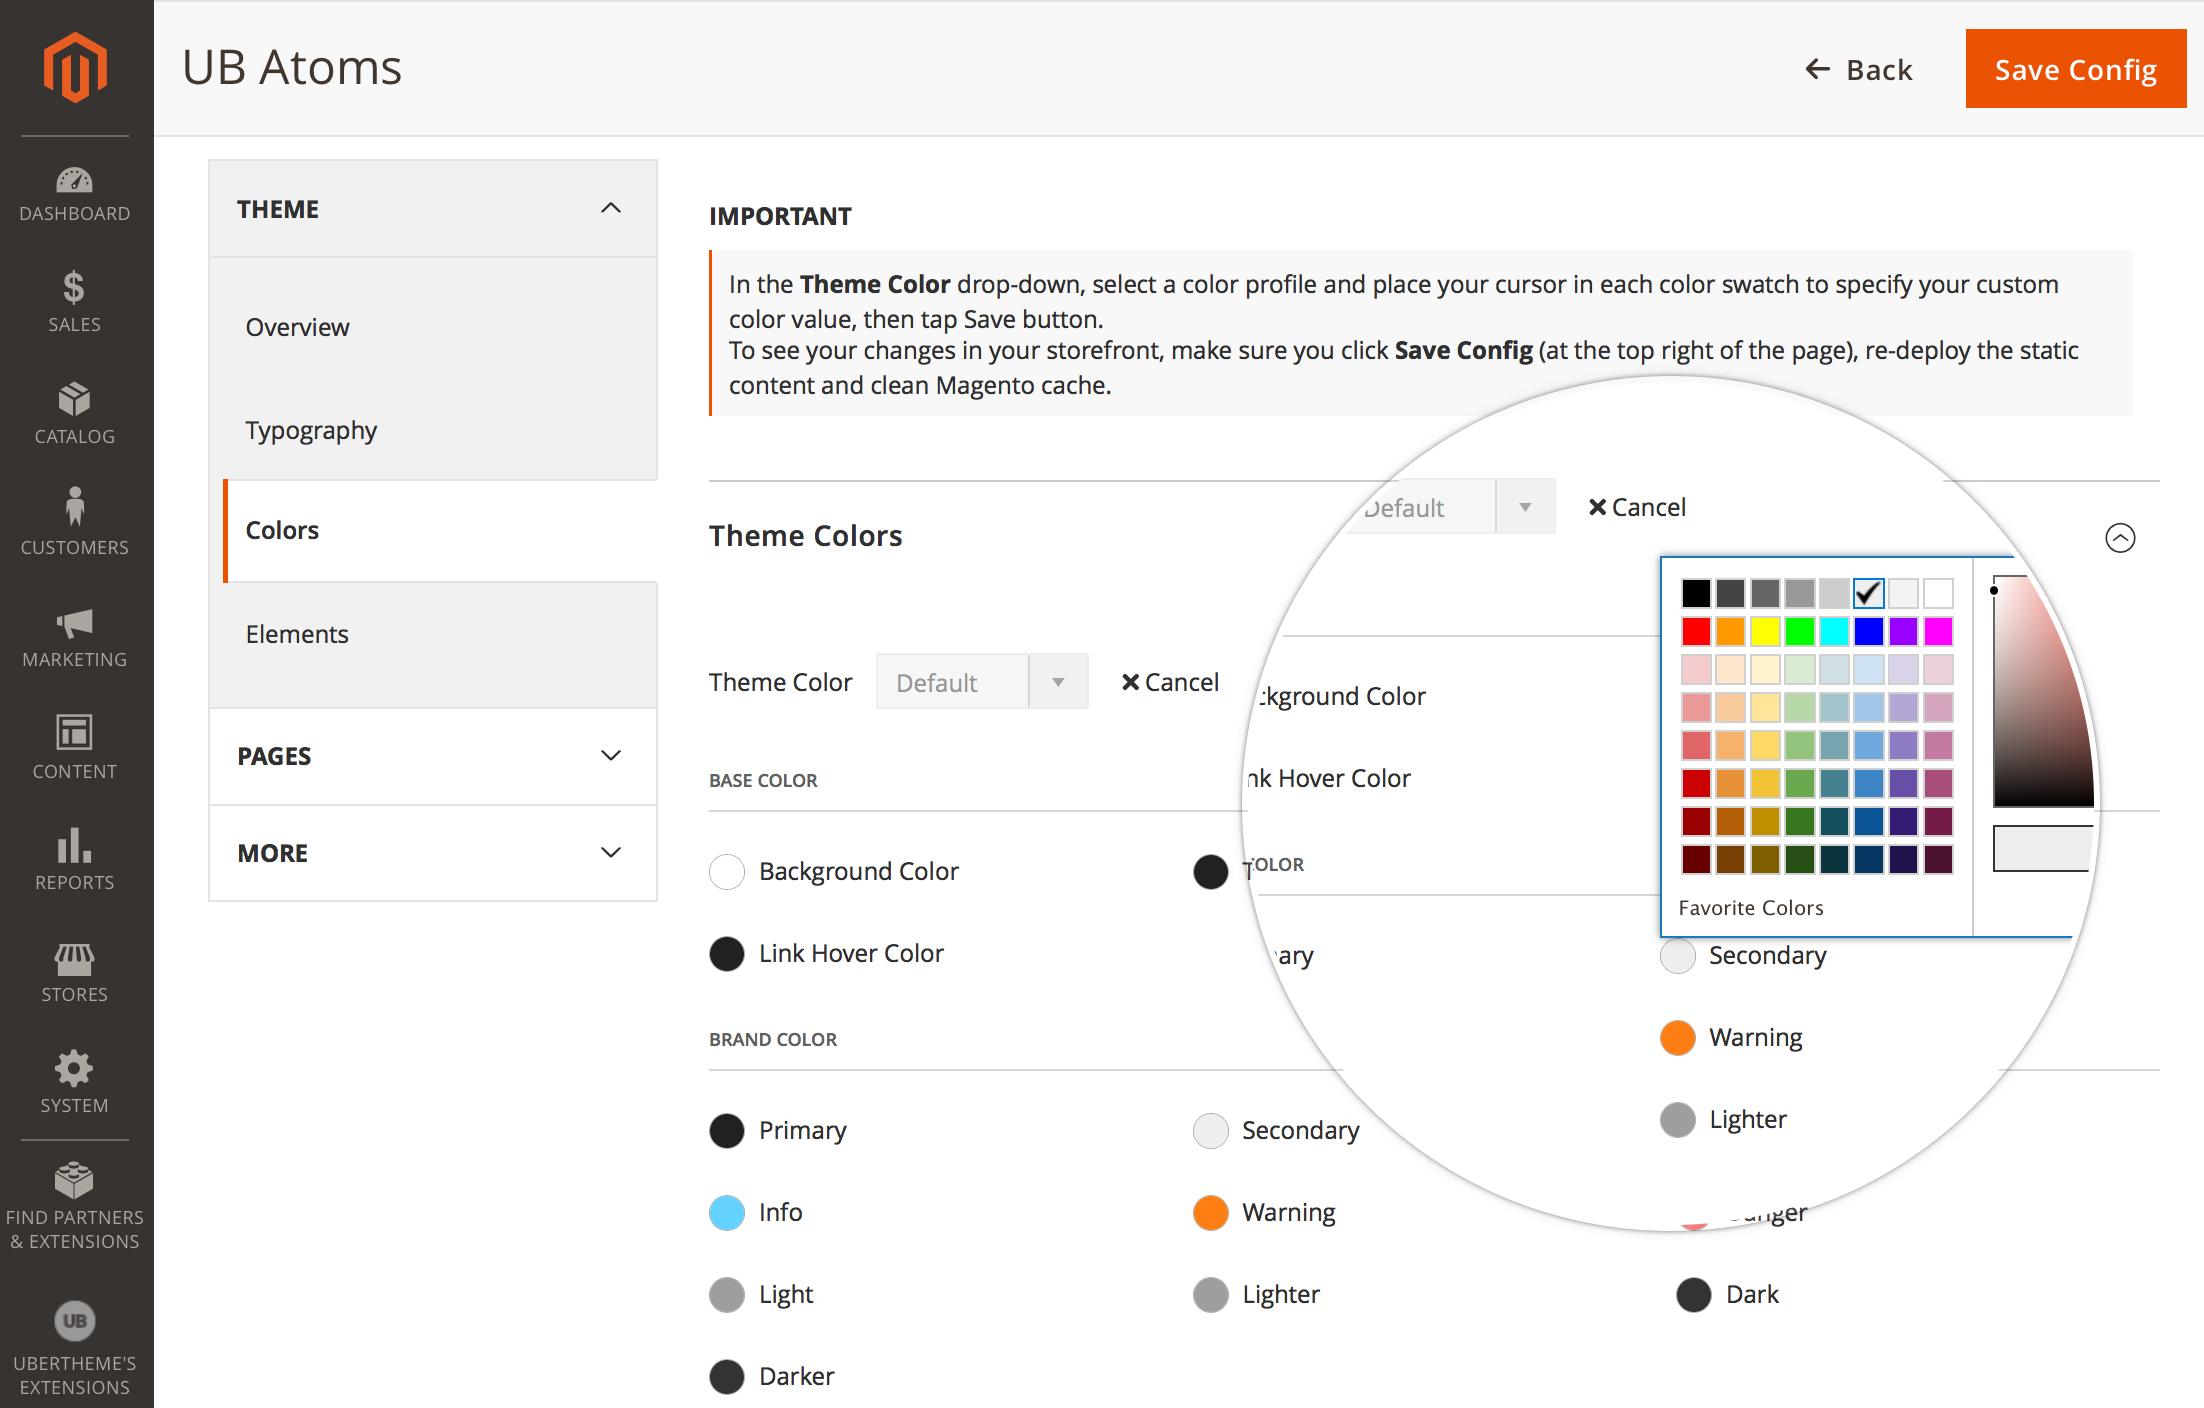 UB Atoms - Premium Magento 2 theme - New Color Profile